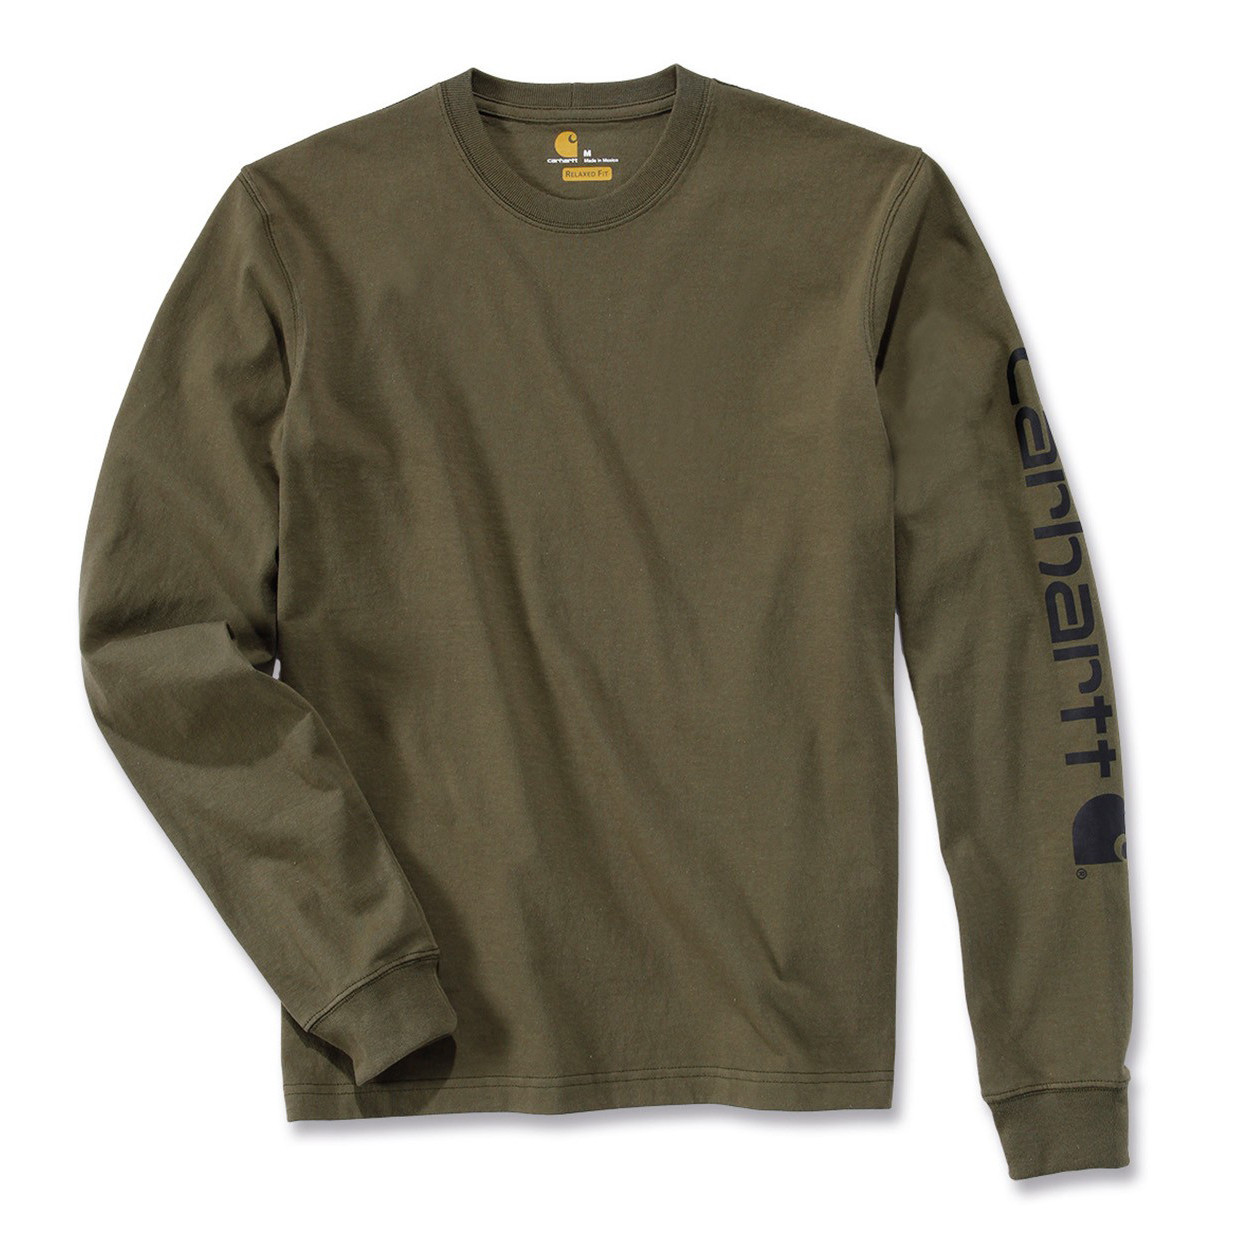 Футболка с длинным рукавом Carhartt Sleeve Logo T-Shirt L/S - EK231 (Army Green, L)